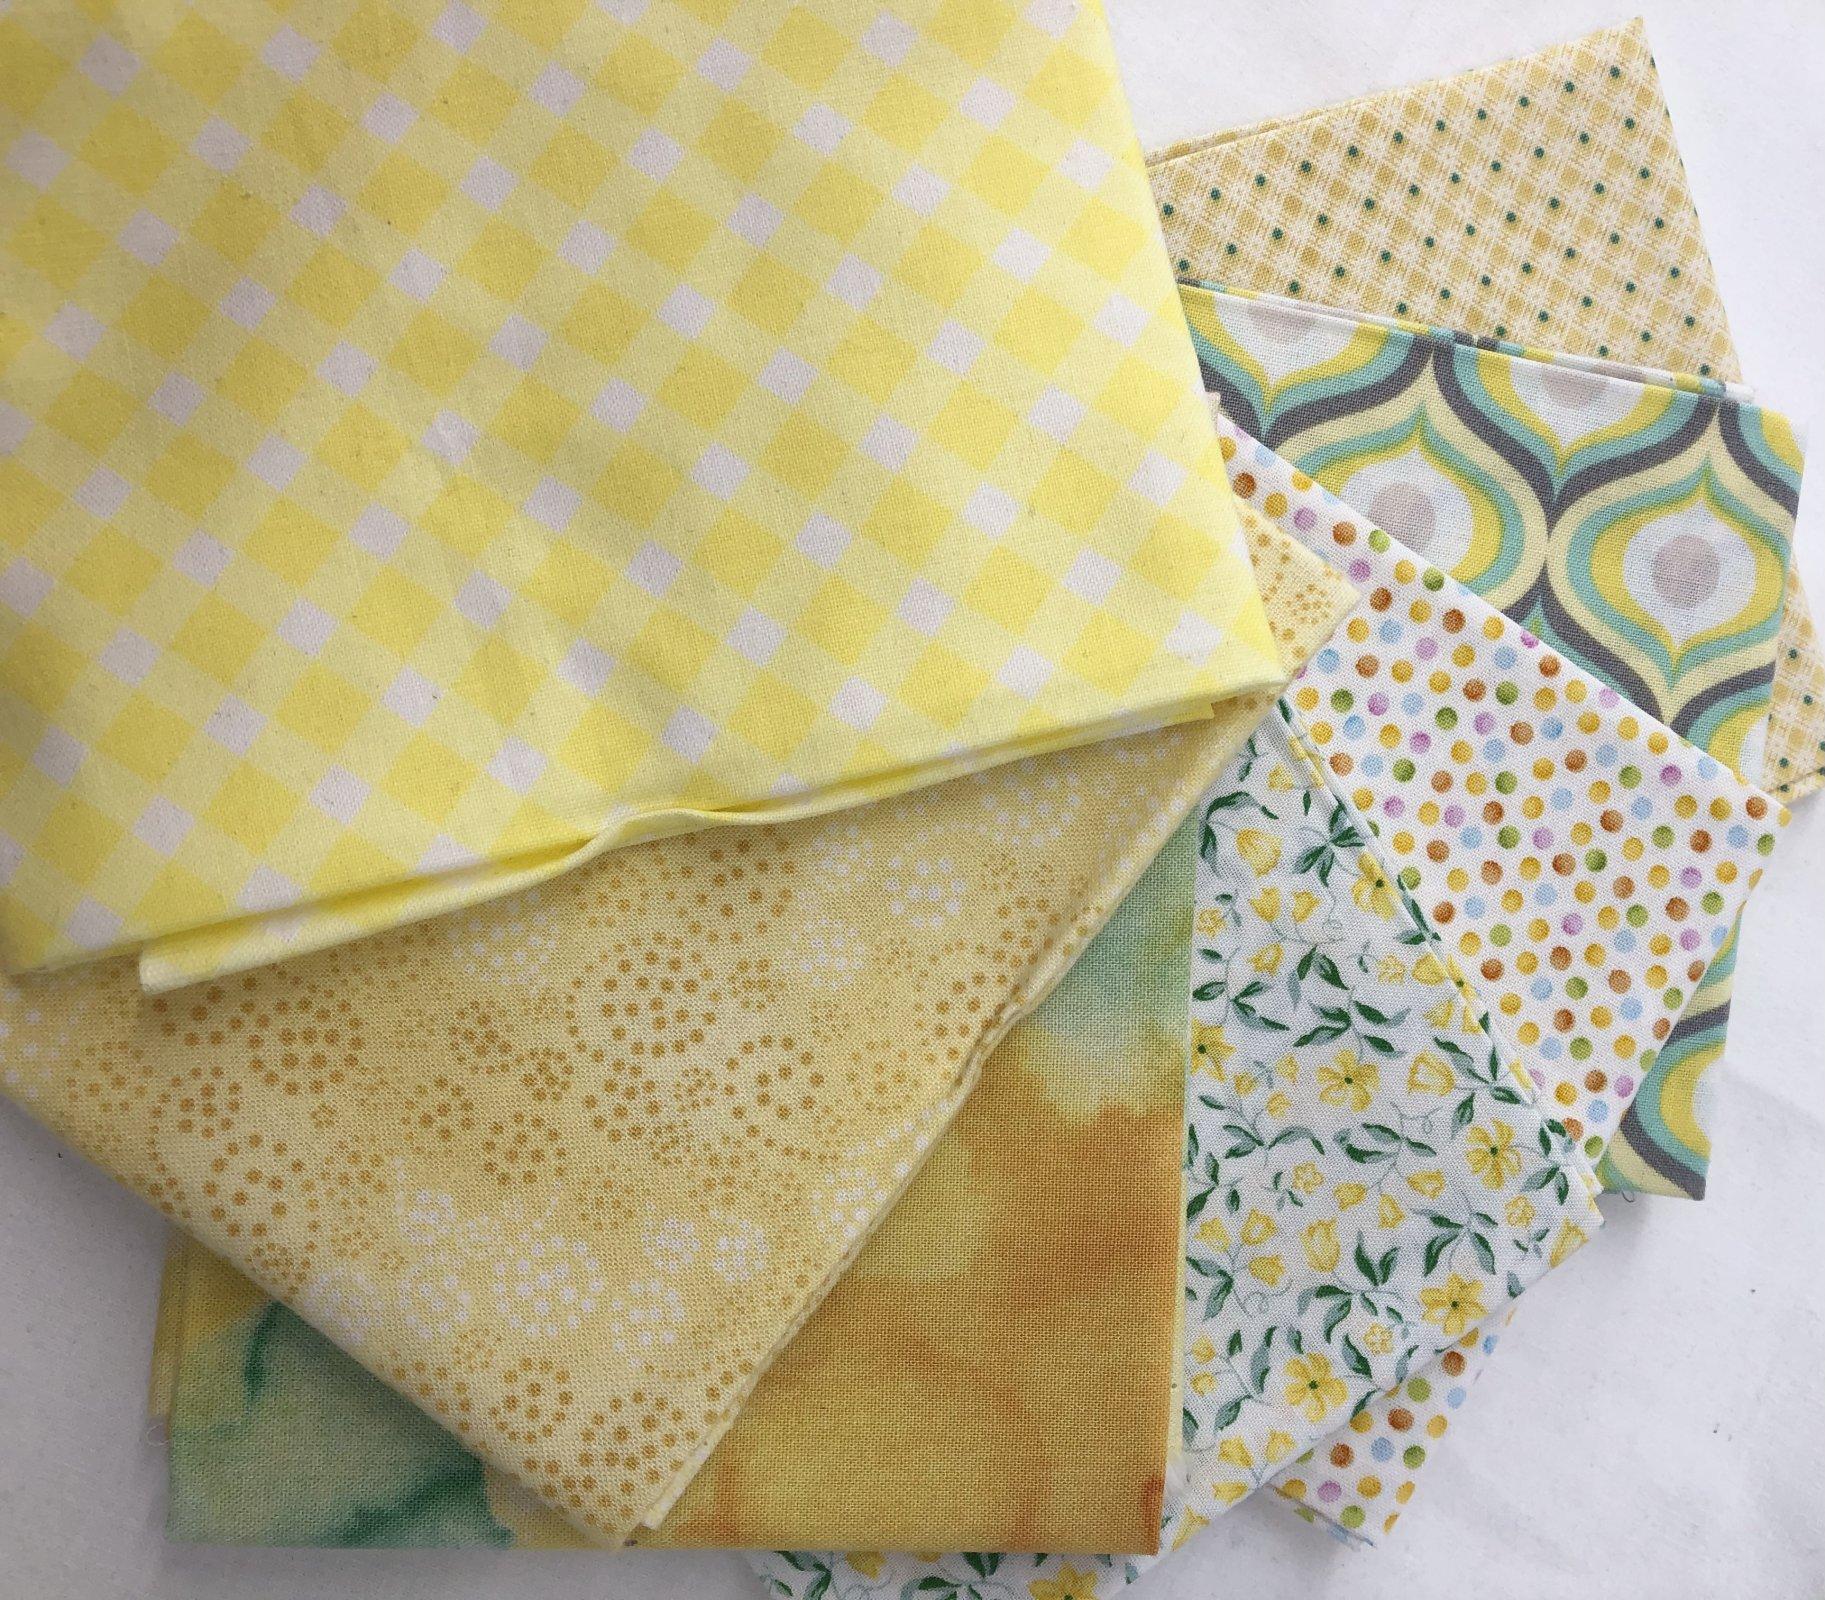 Fat Quarter Pack - 7pcs/bundle - In store - Yellow